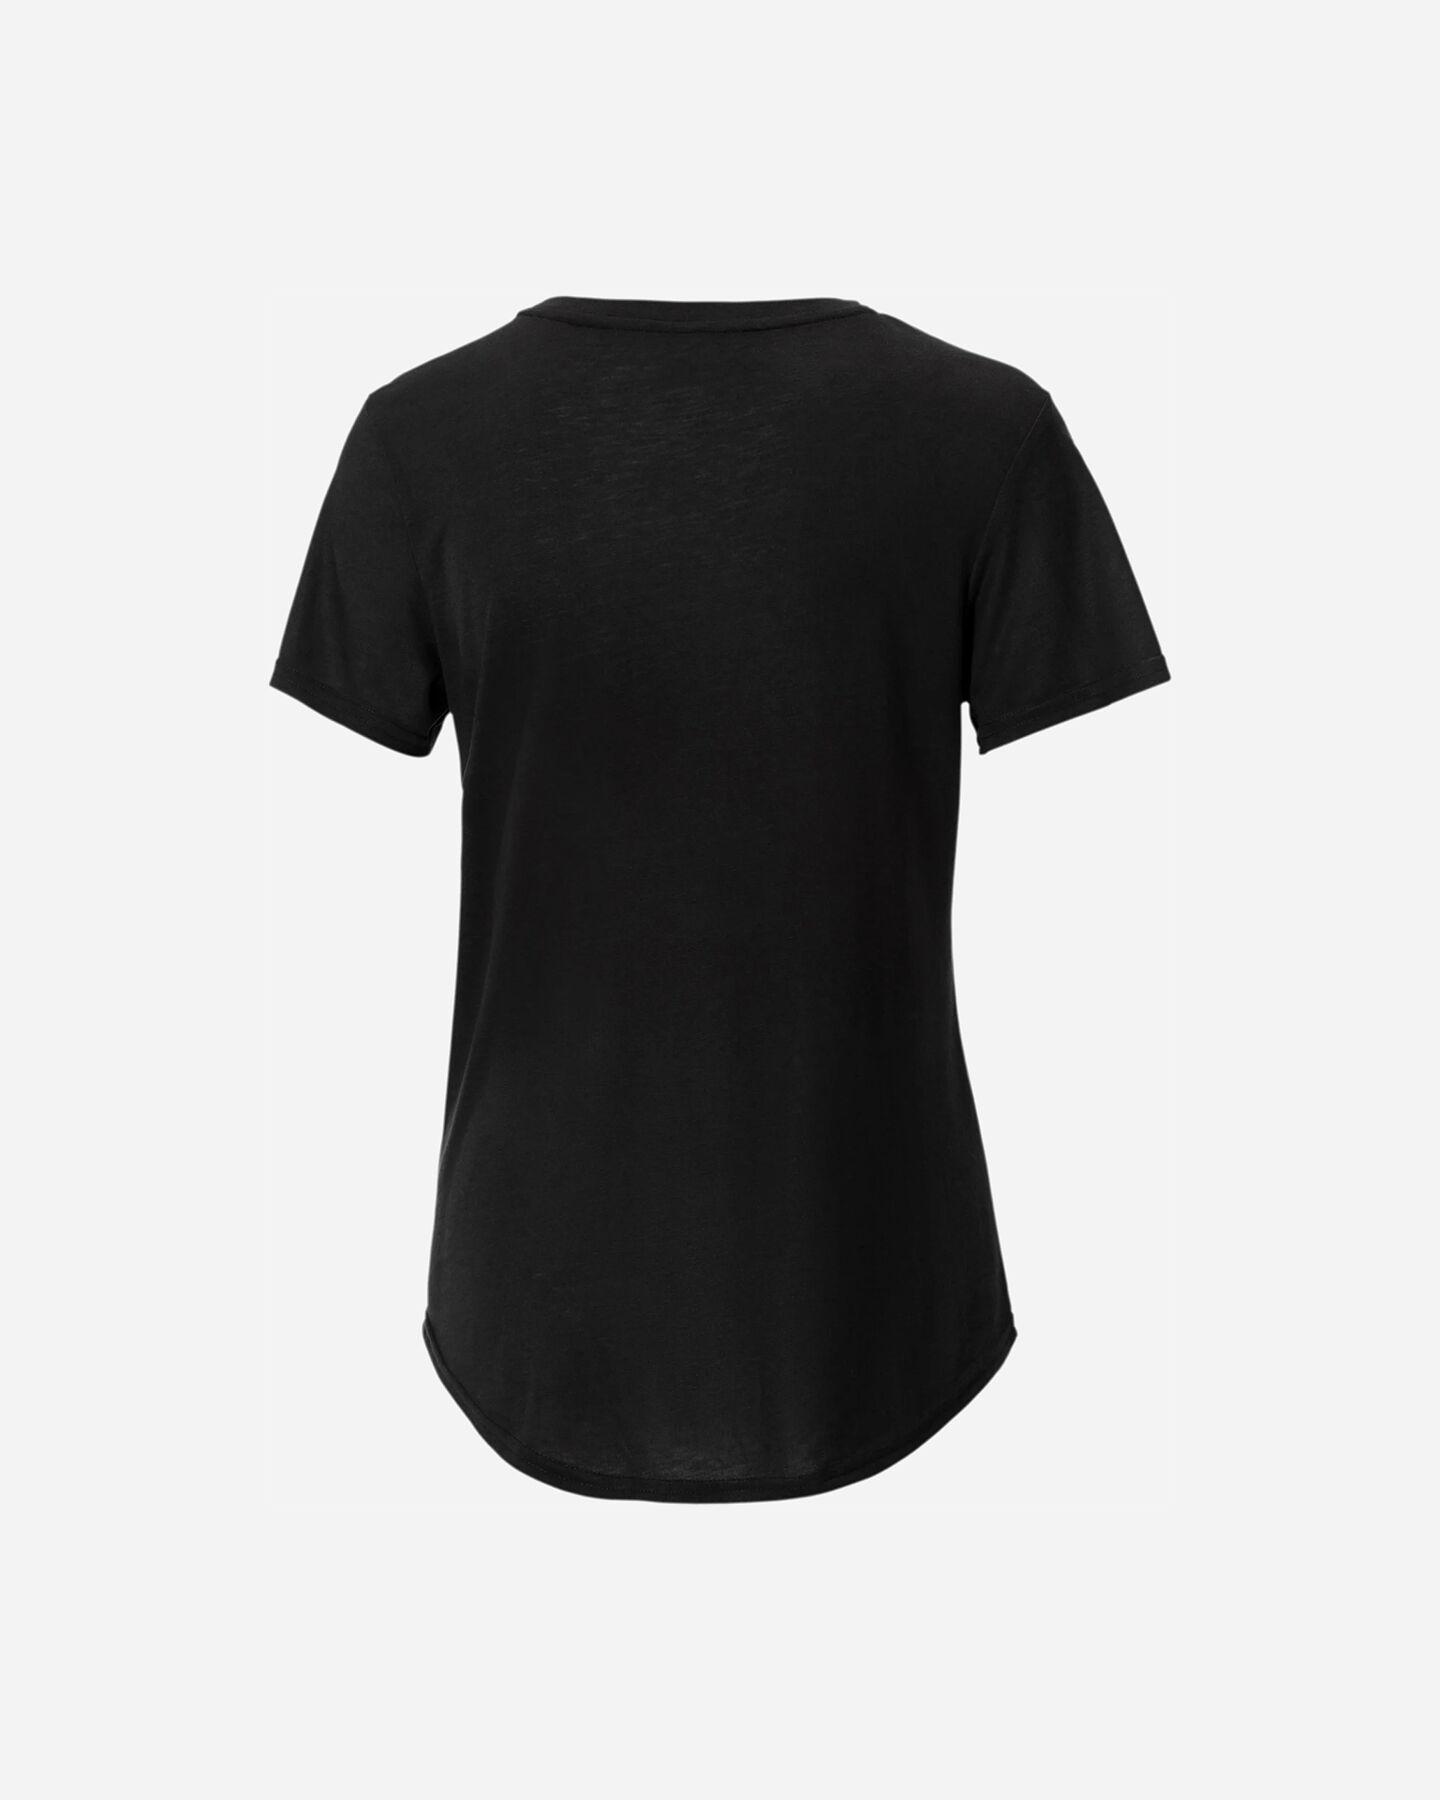 T-Shirt PUMA BIG LOGO W S5235205 scatto 1